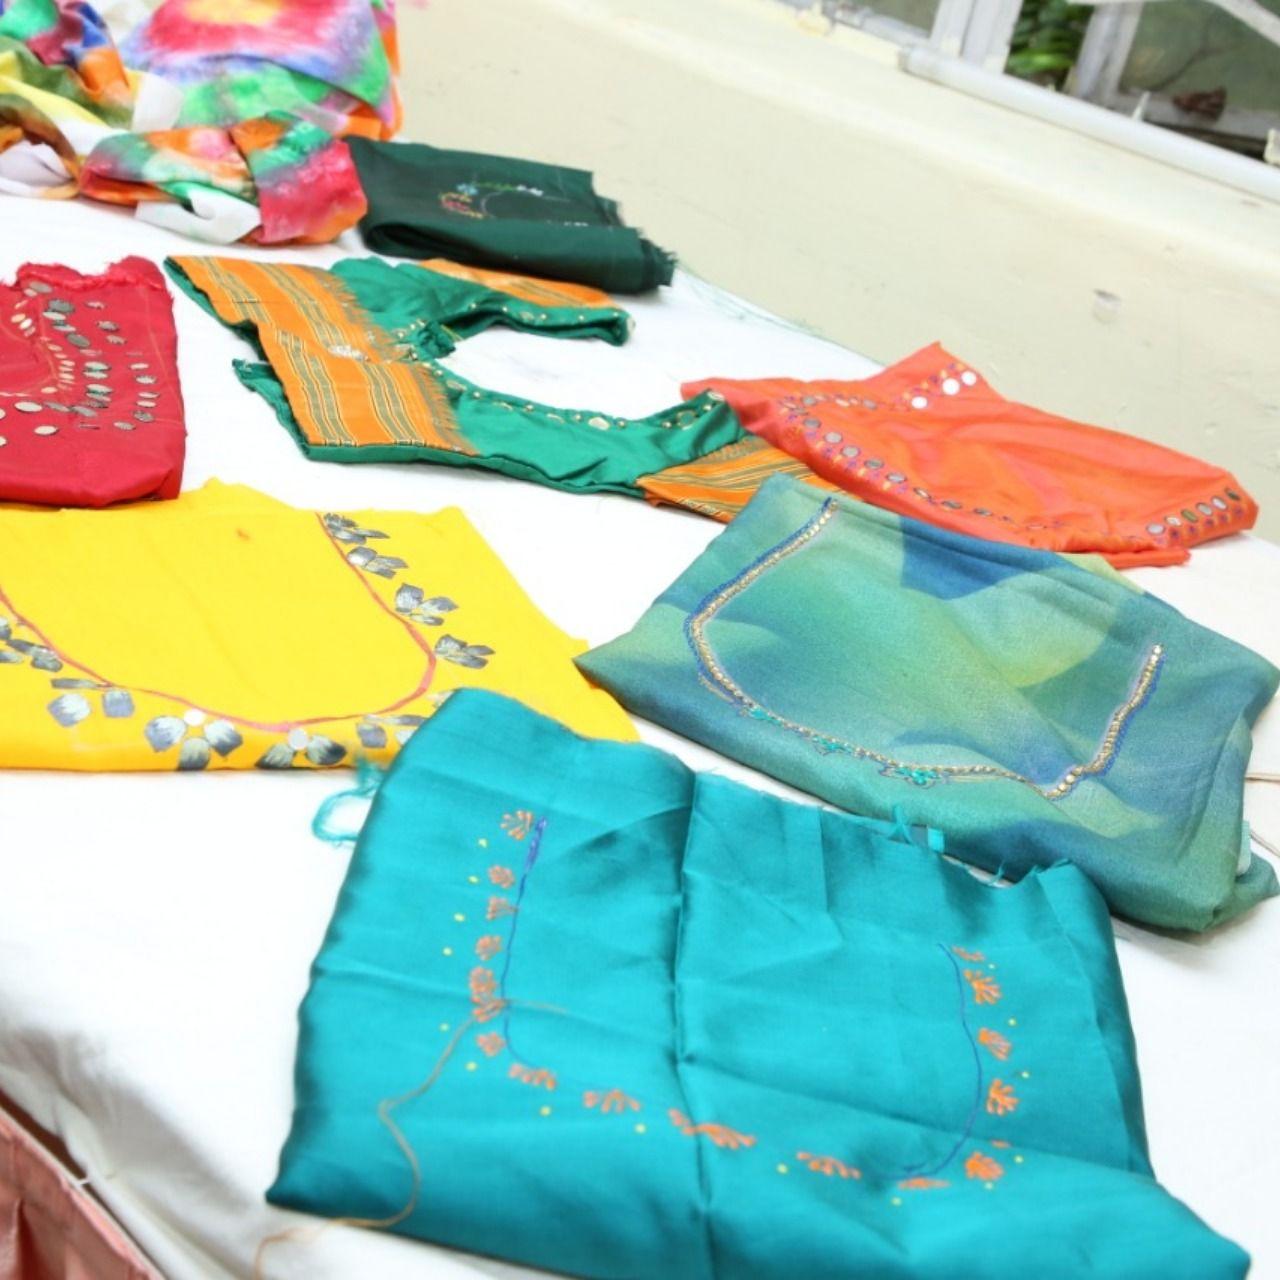 Handmadedresses Handicrafts Craftexhibition Handmadejewelryforsale Artsandcrafts Studentworks Artexhibition Fashion Contact Career In Fashion Designing